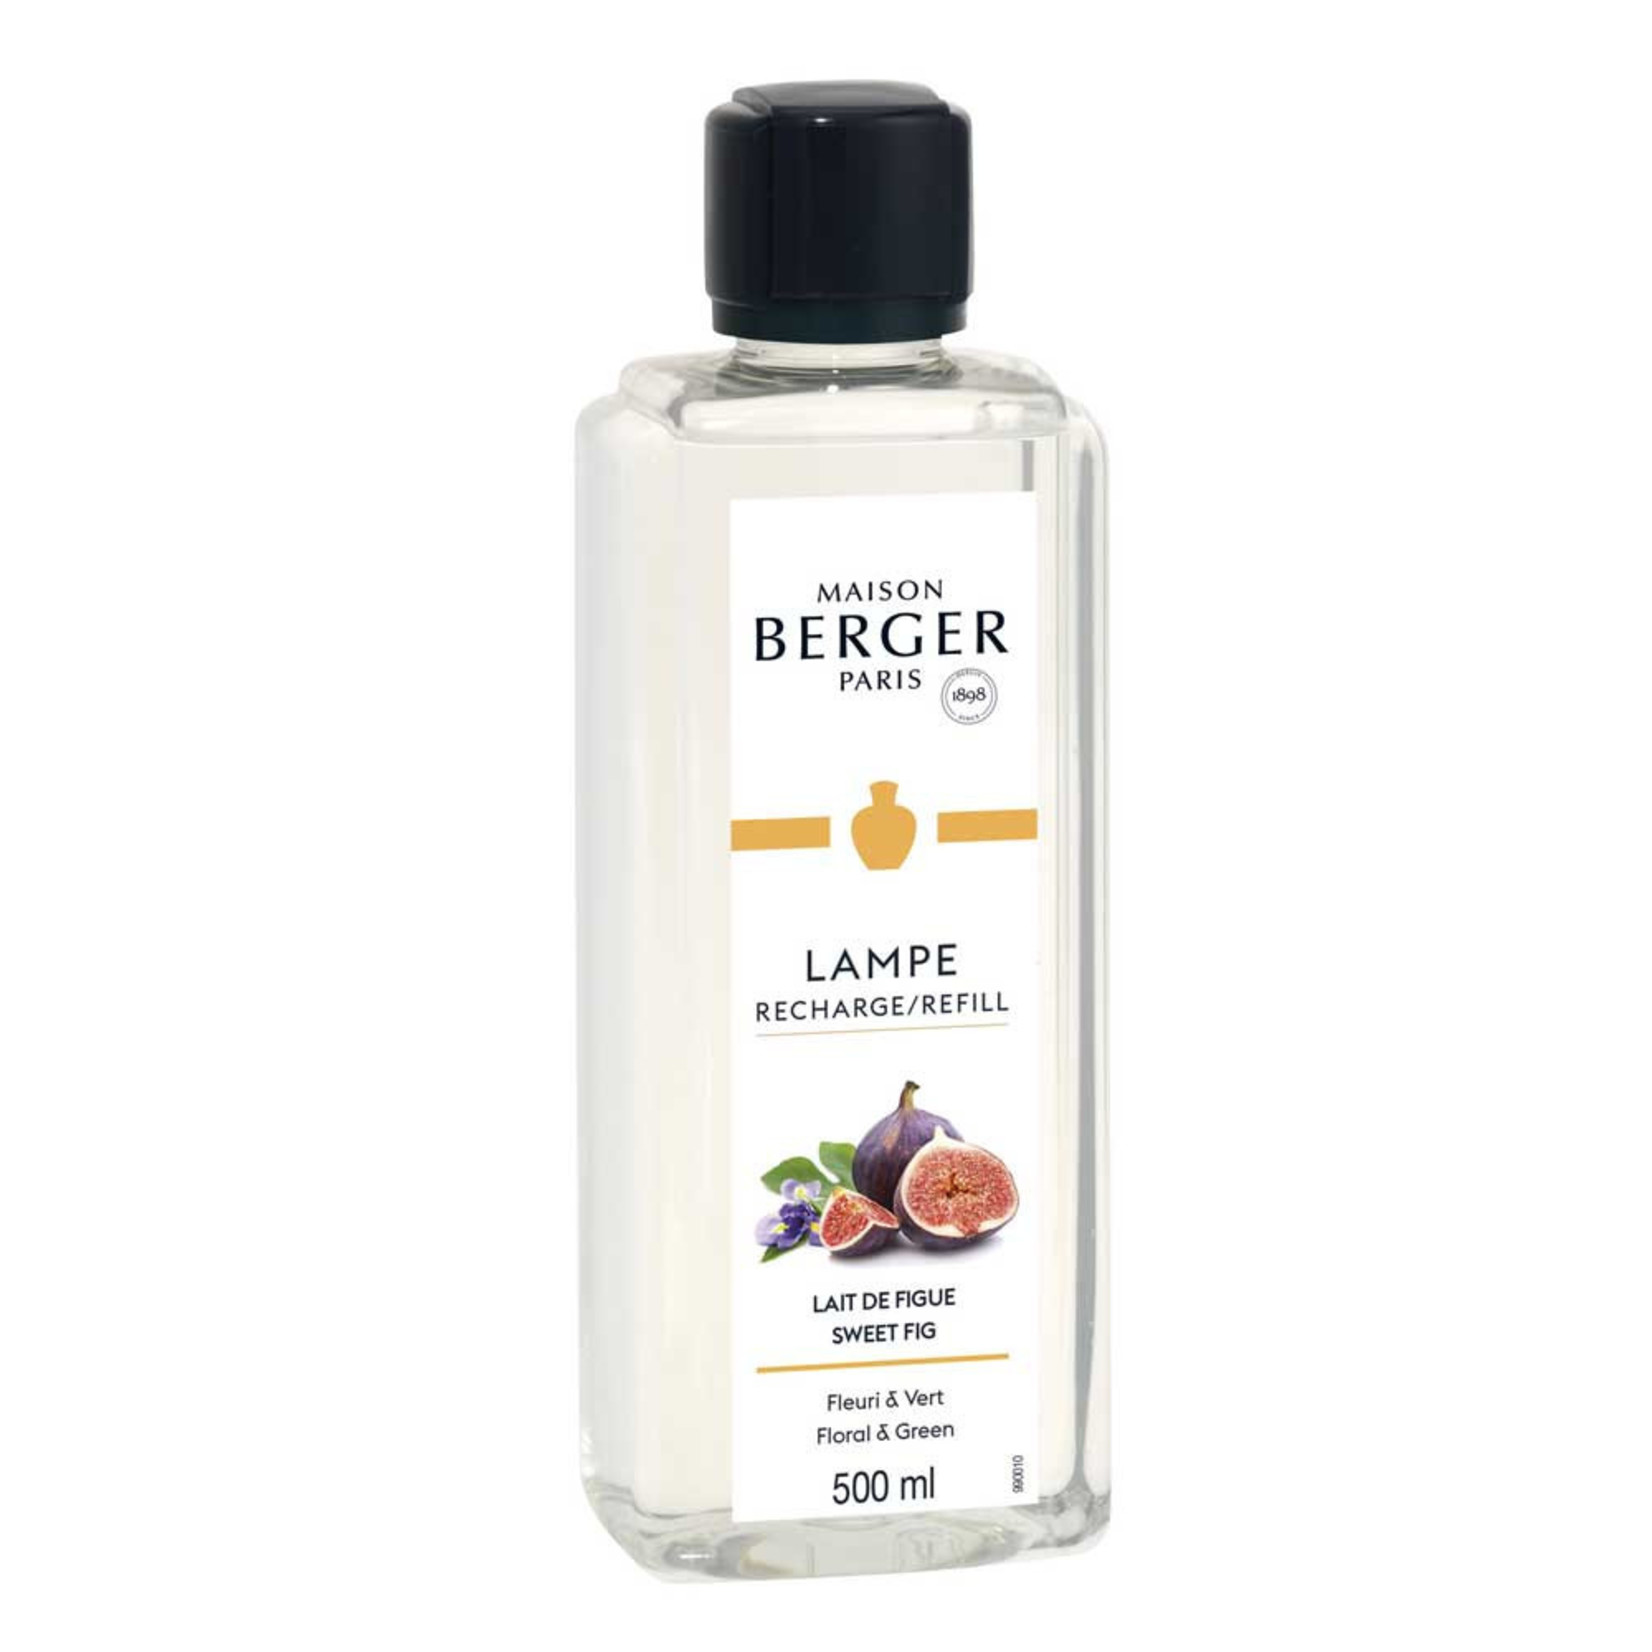 Maison Berger Paris Sweet Fig Lamp Fragrance